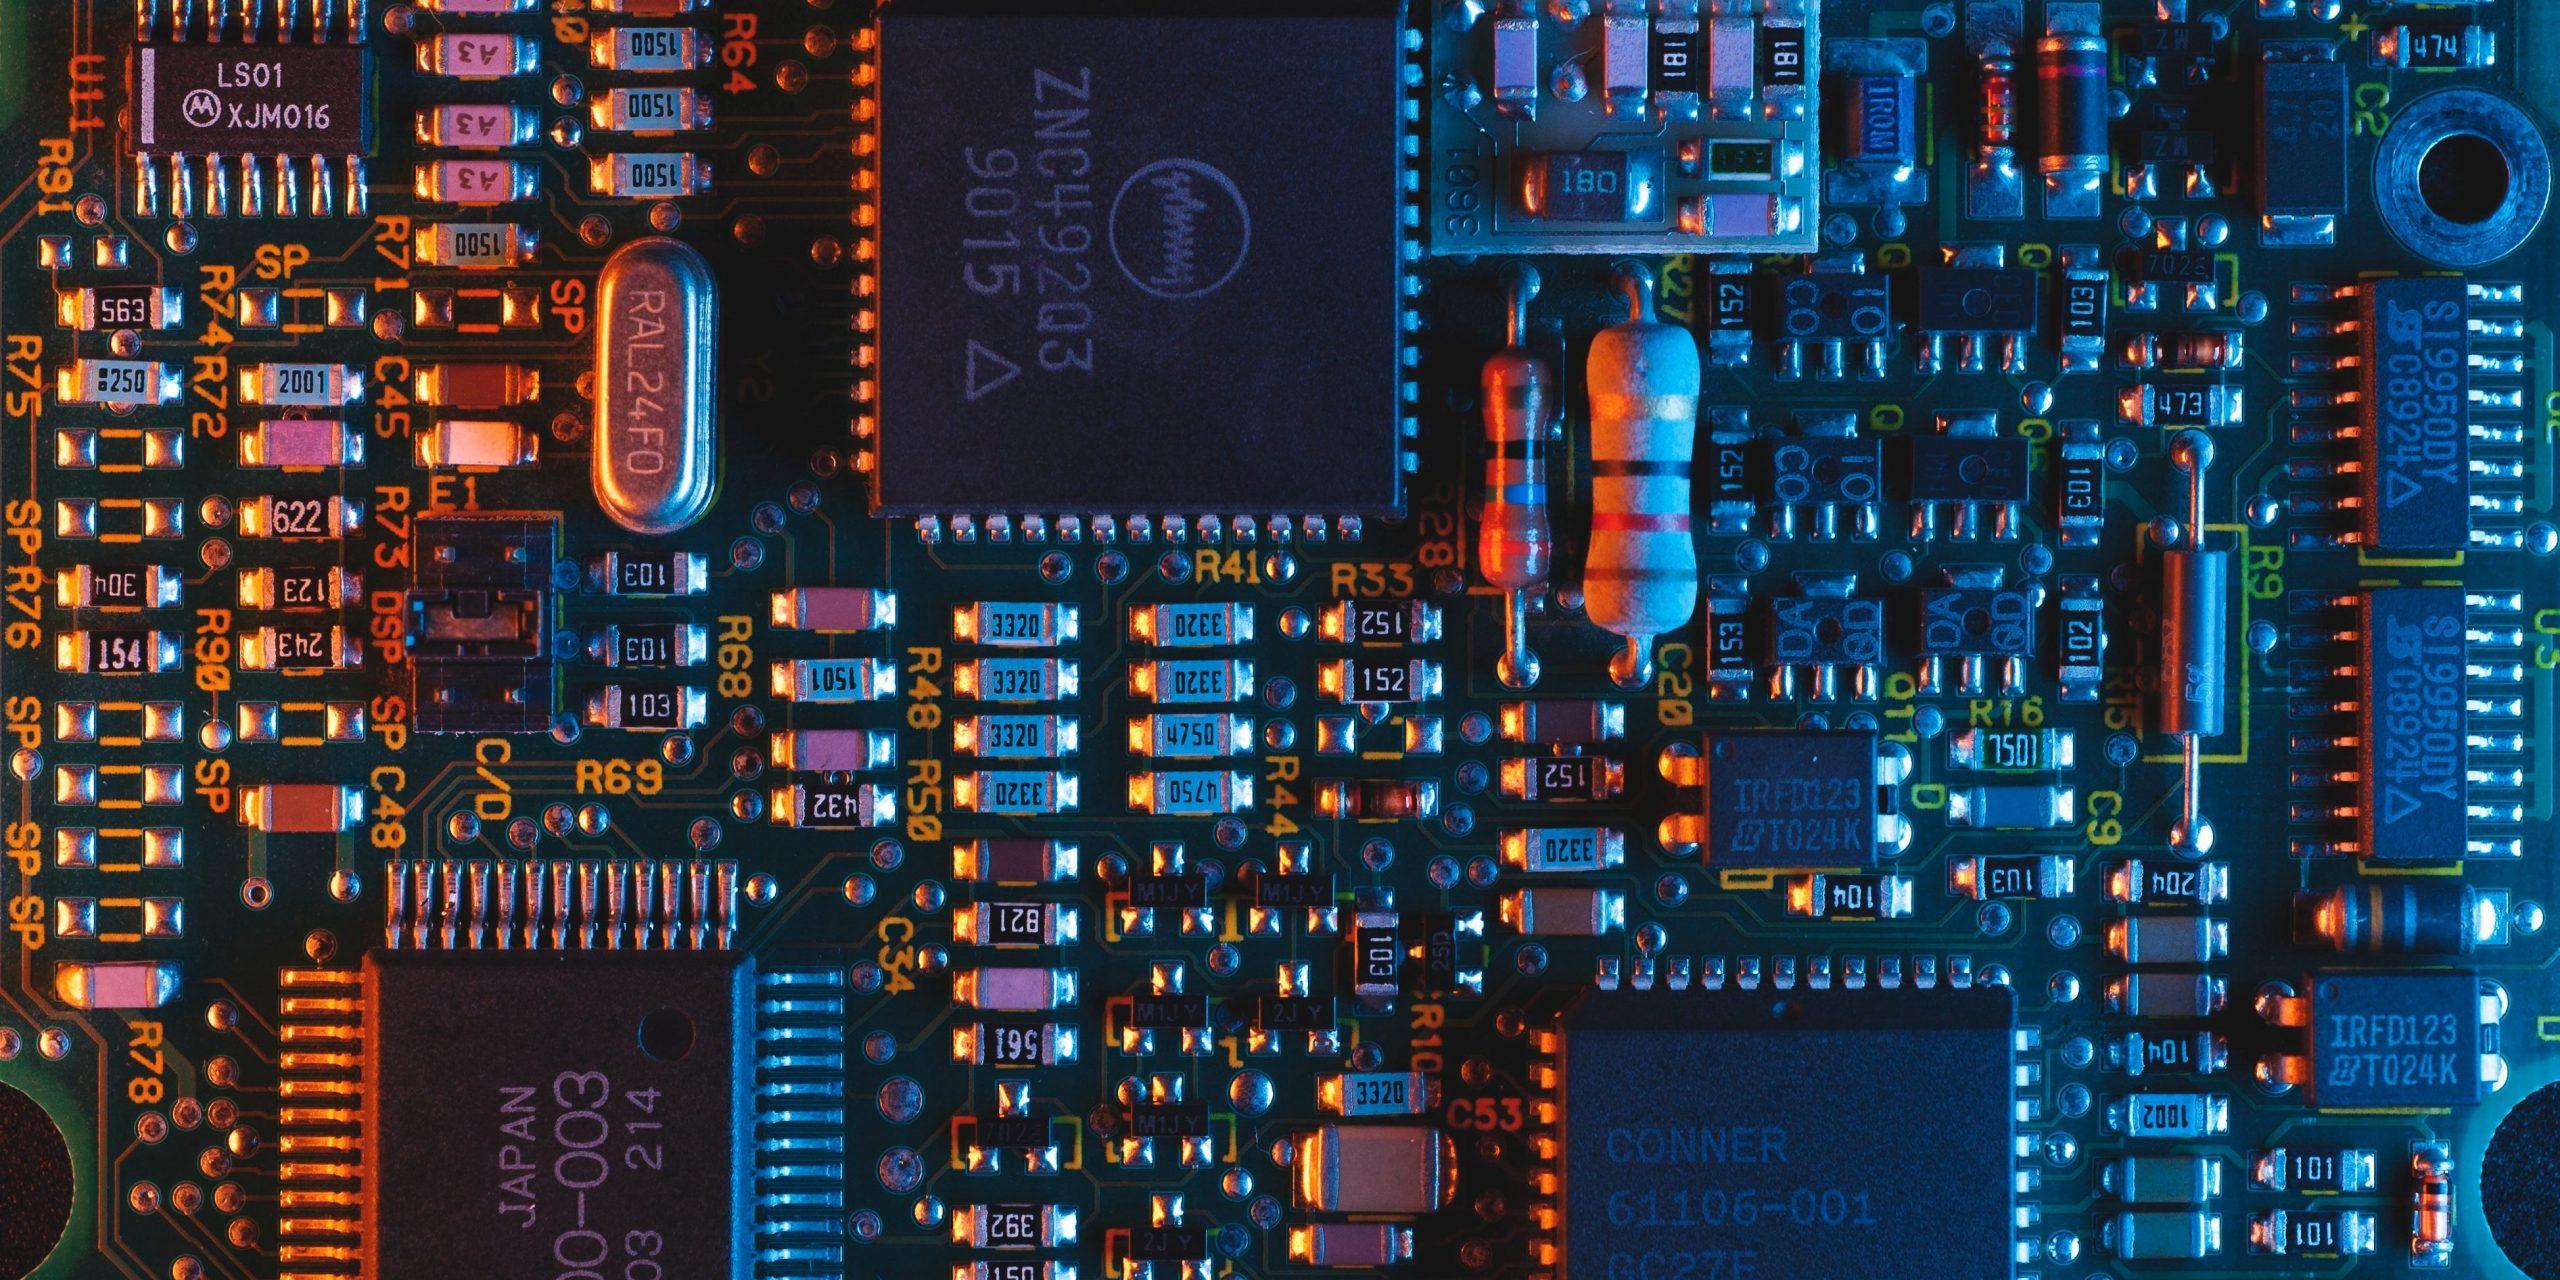 842 чипа в секунду: в IV квартале 2020 года произведено 6,7 миллиарда чипов на базе ARM